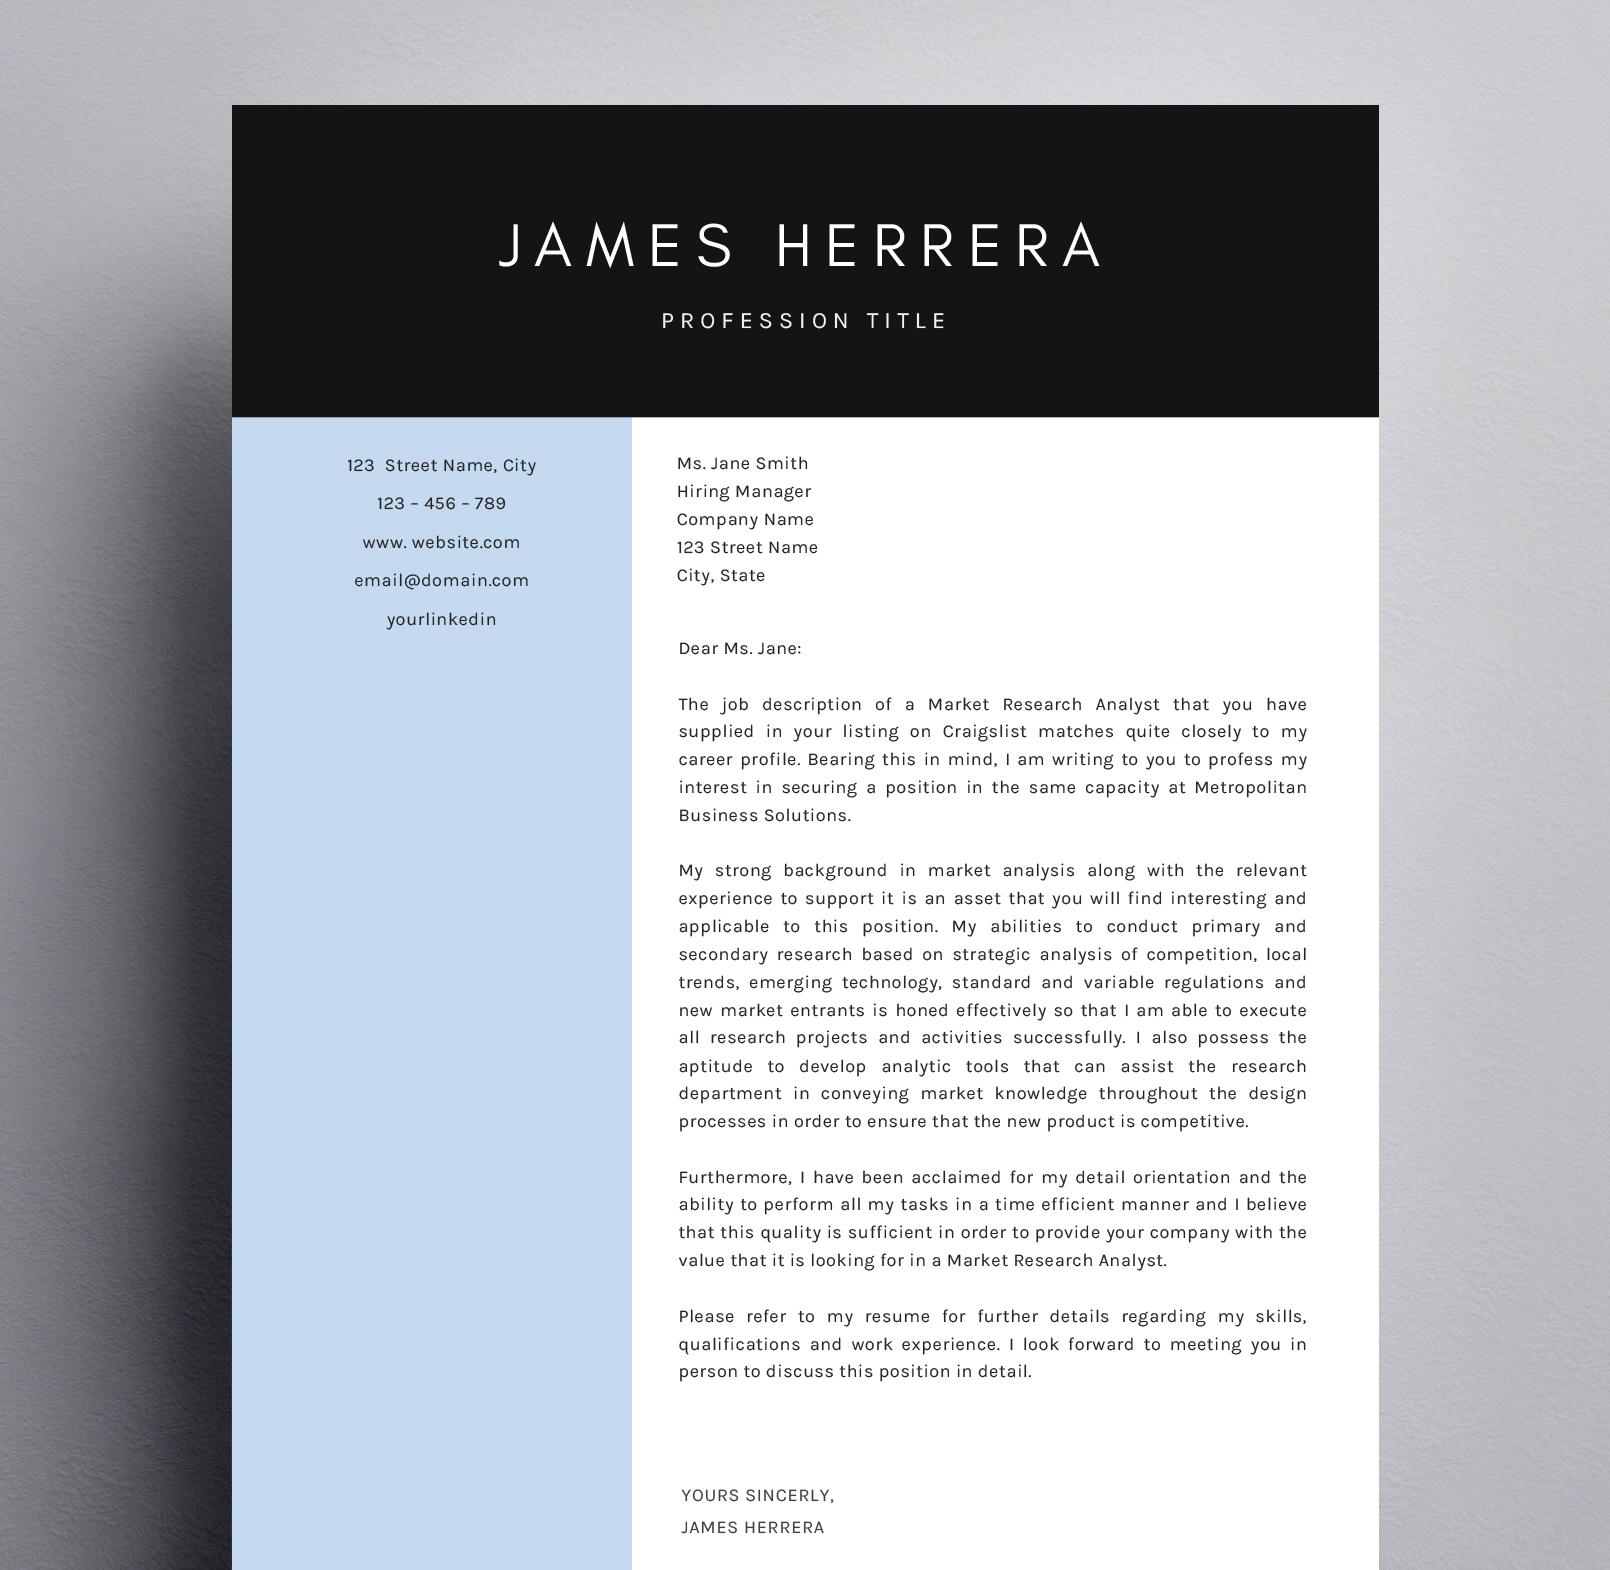 James Herrera Cover Letter Kukook